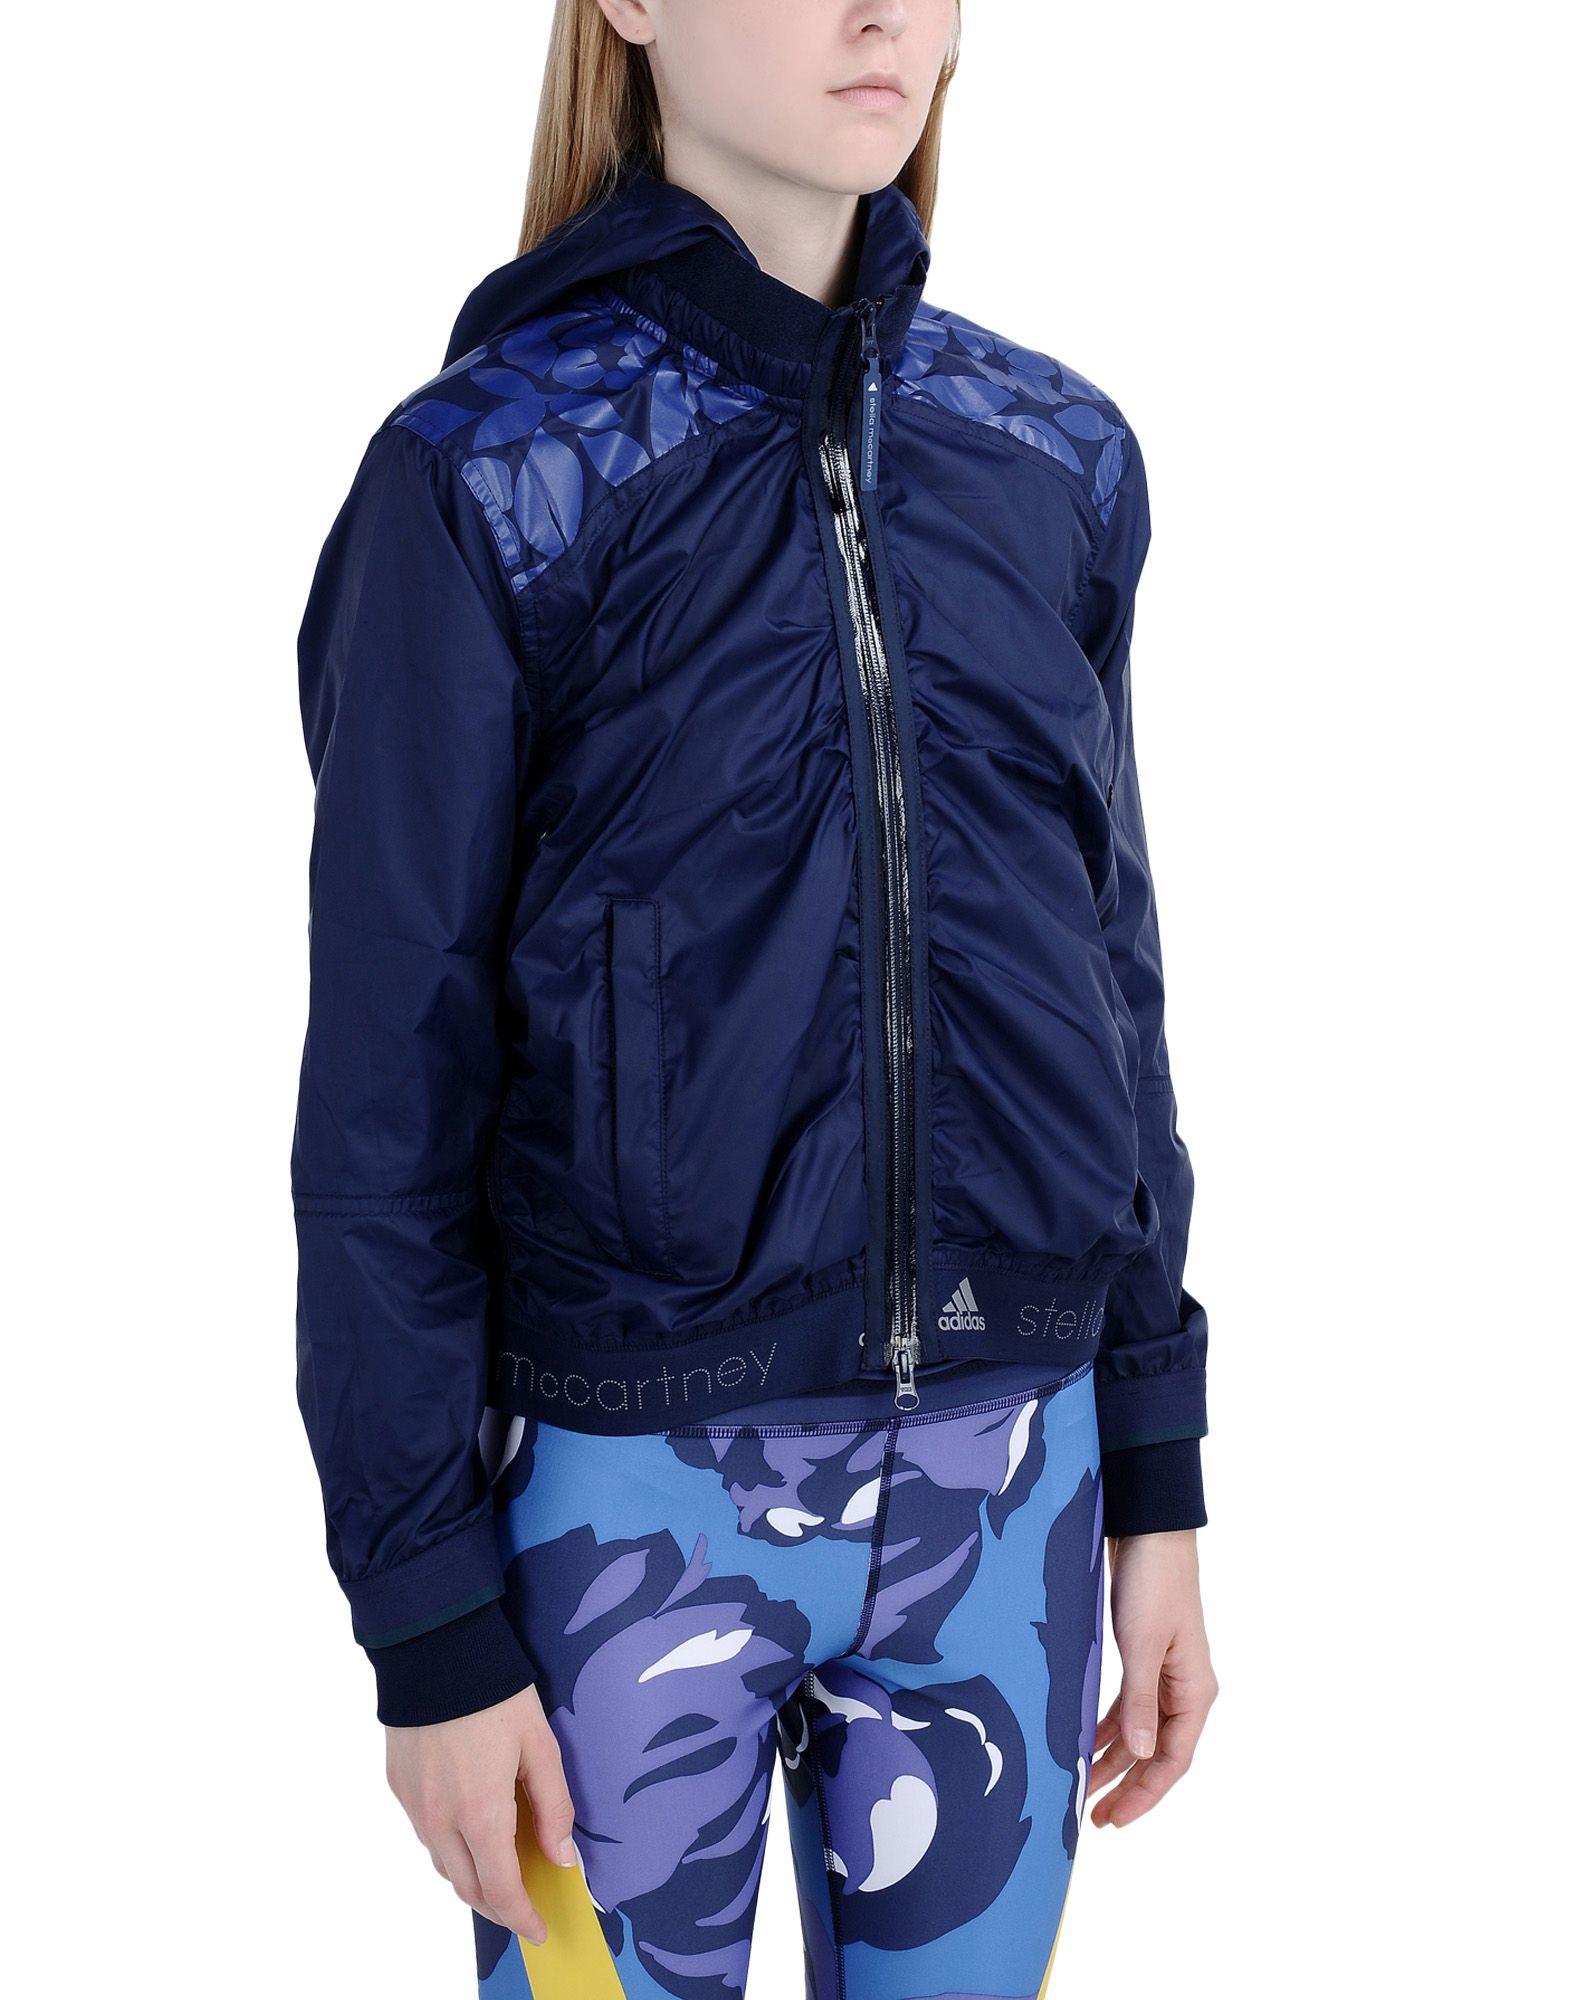 adidas by stella mccartney jacket in blue dark blue lyst. Black Bedroom Furniture Sets. Home Design Ideas